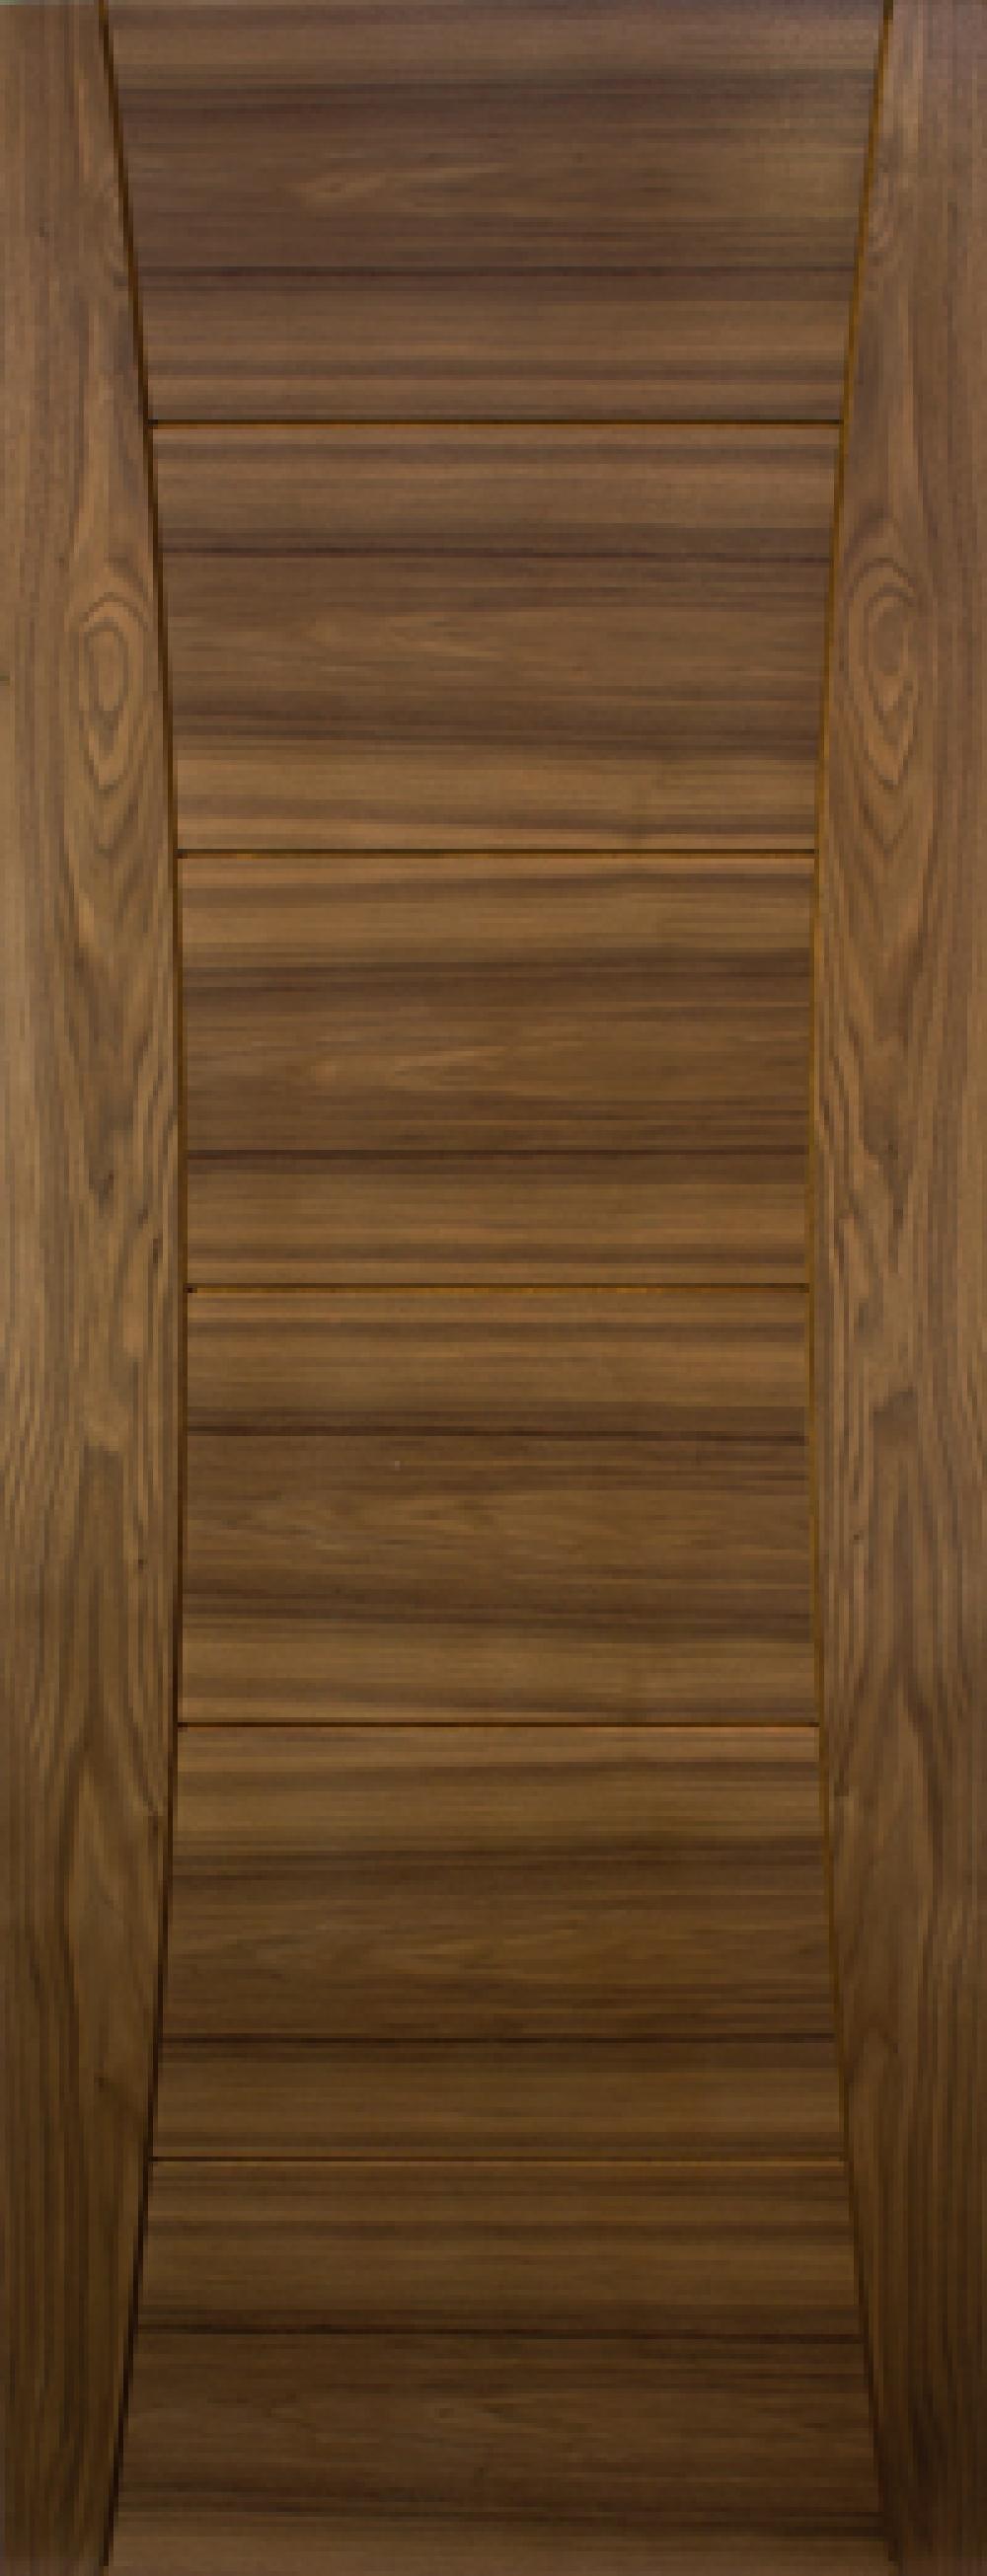 Pamplona Walnut Door - Prefinished